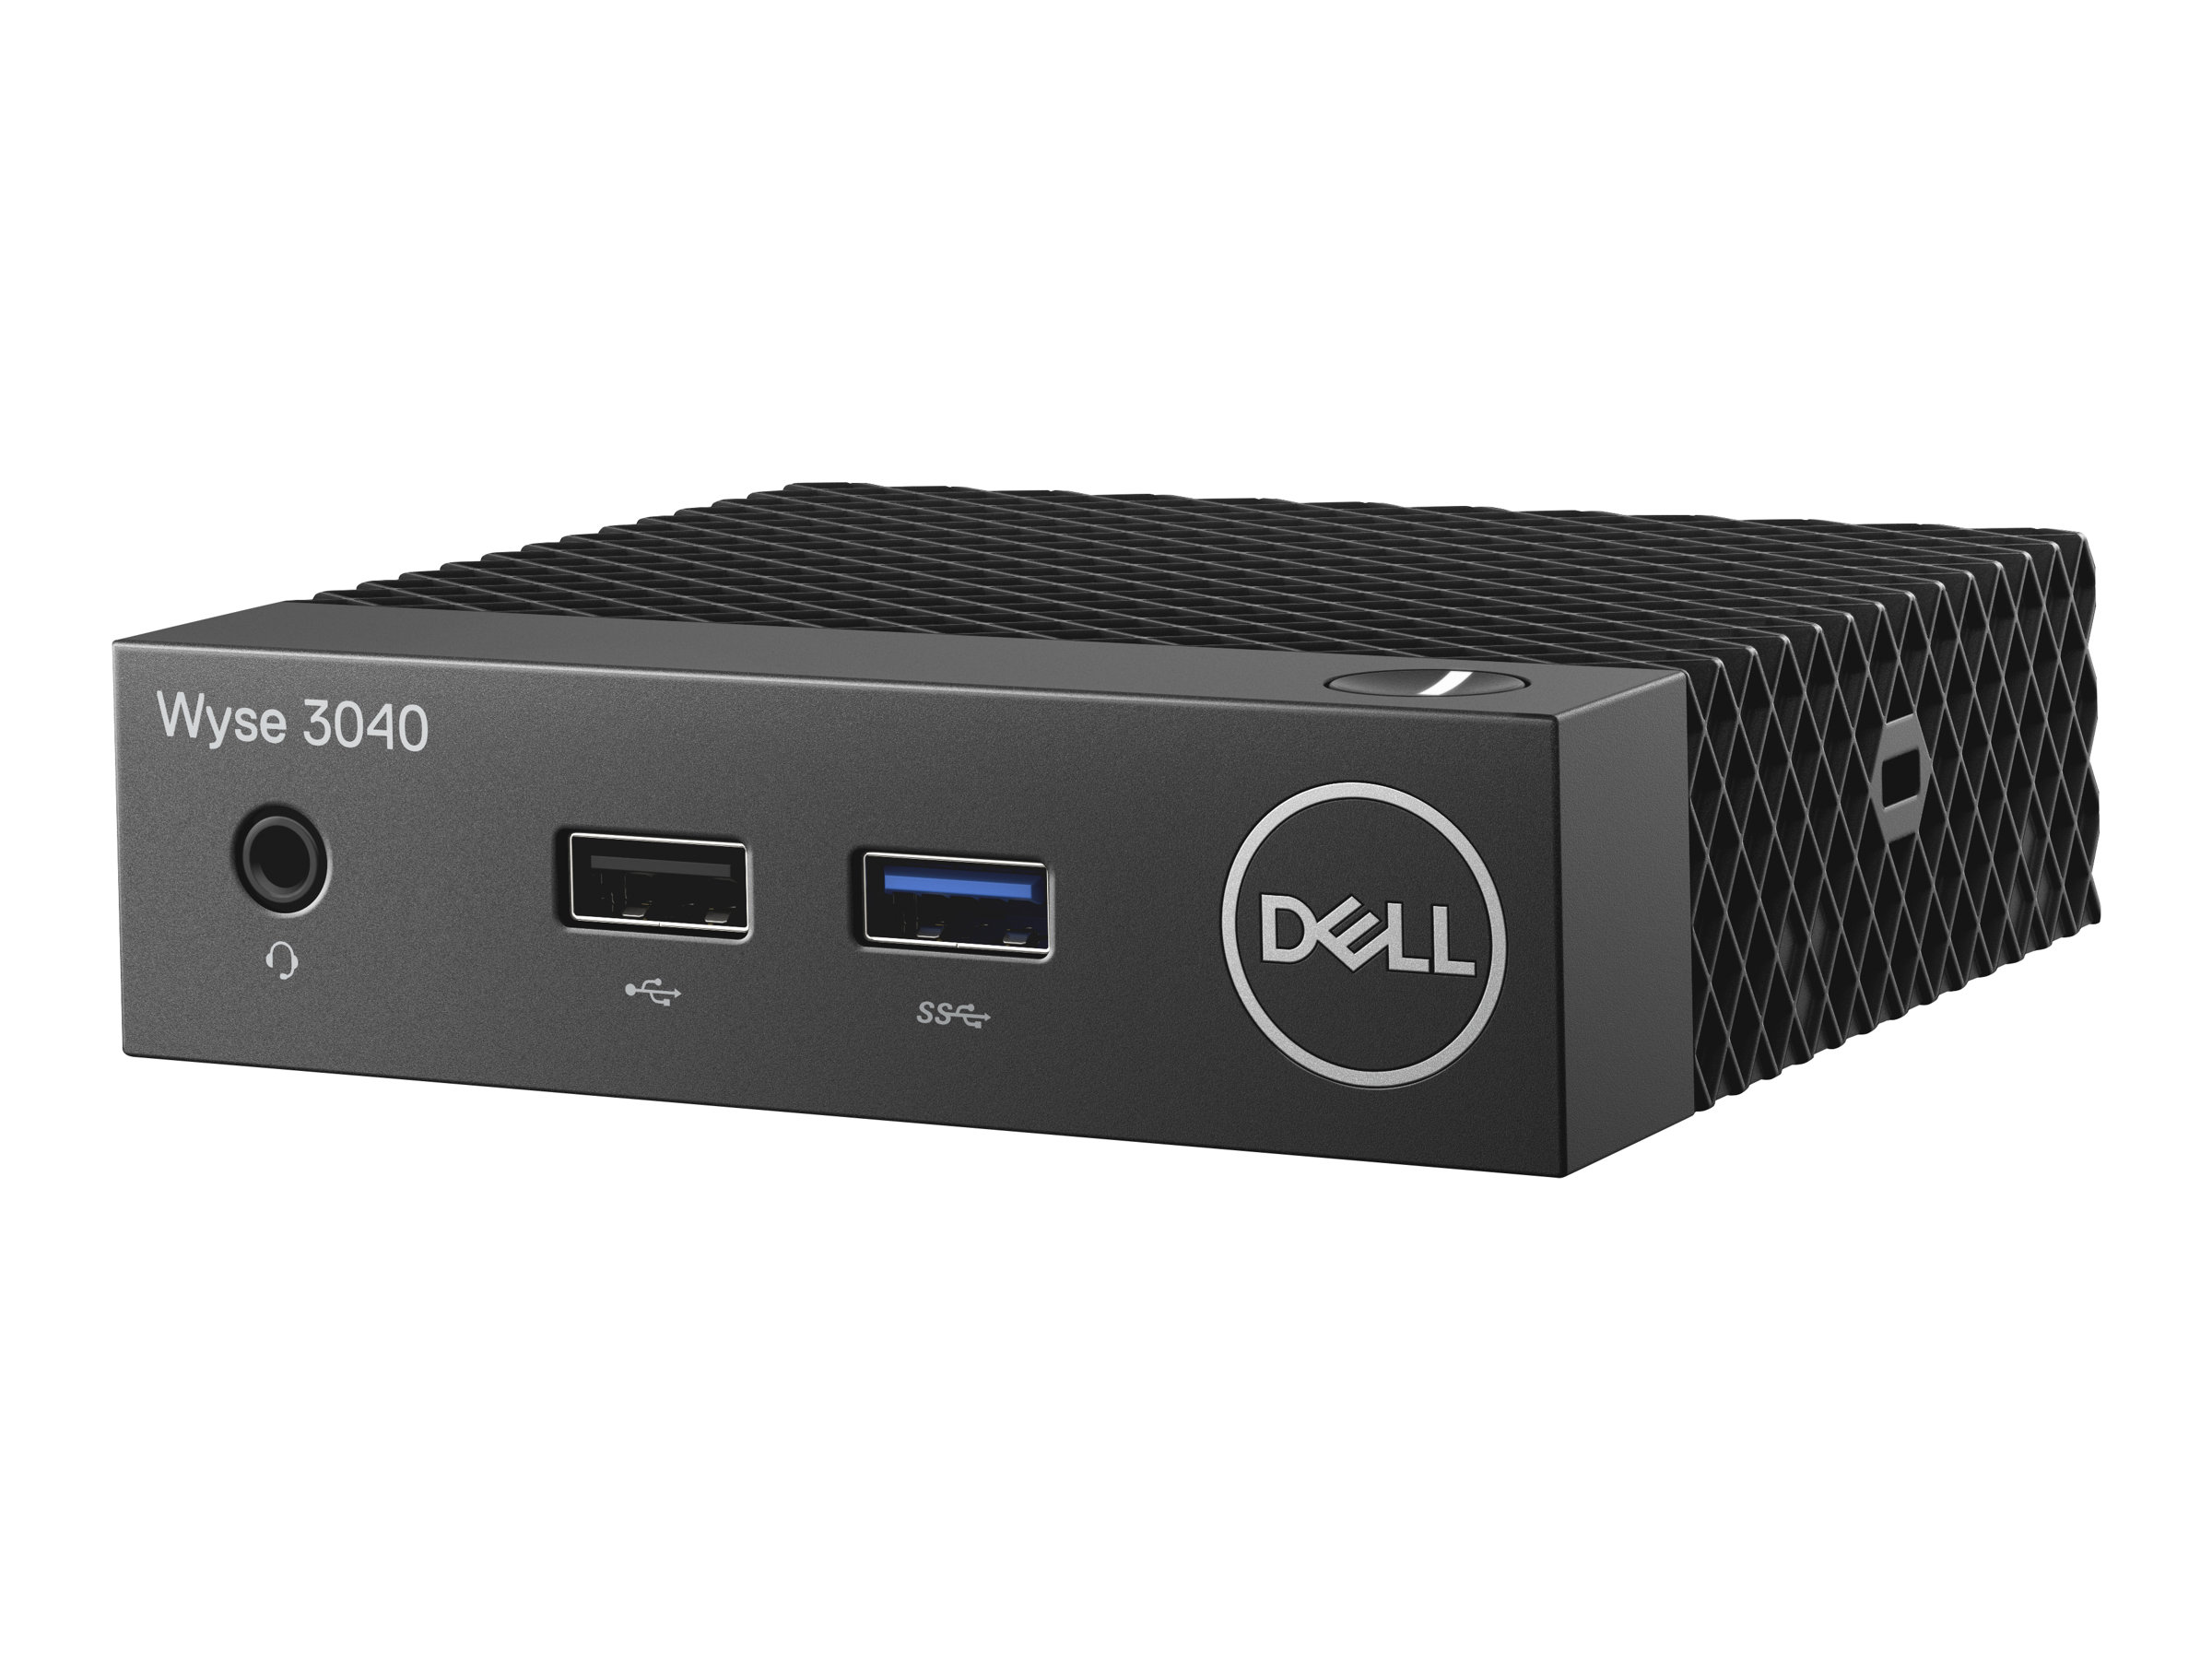 Dell Wyse 3040 - Thin Client - DTS - 1 x Atom x5 Z8350 / 1.44 GHz - RAM 2 GB - Flash